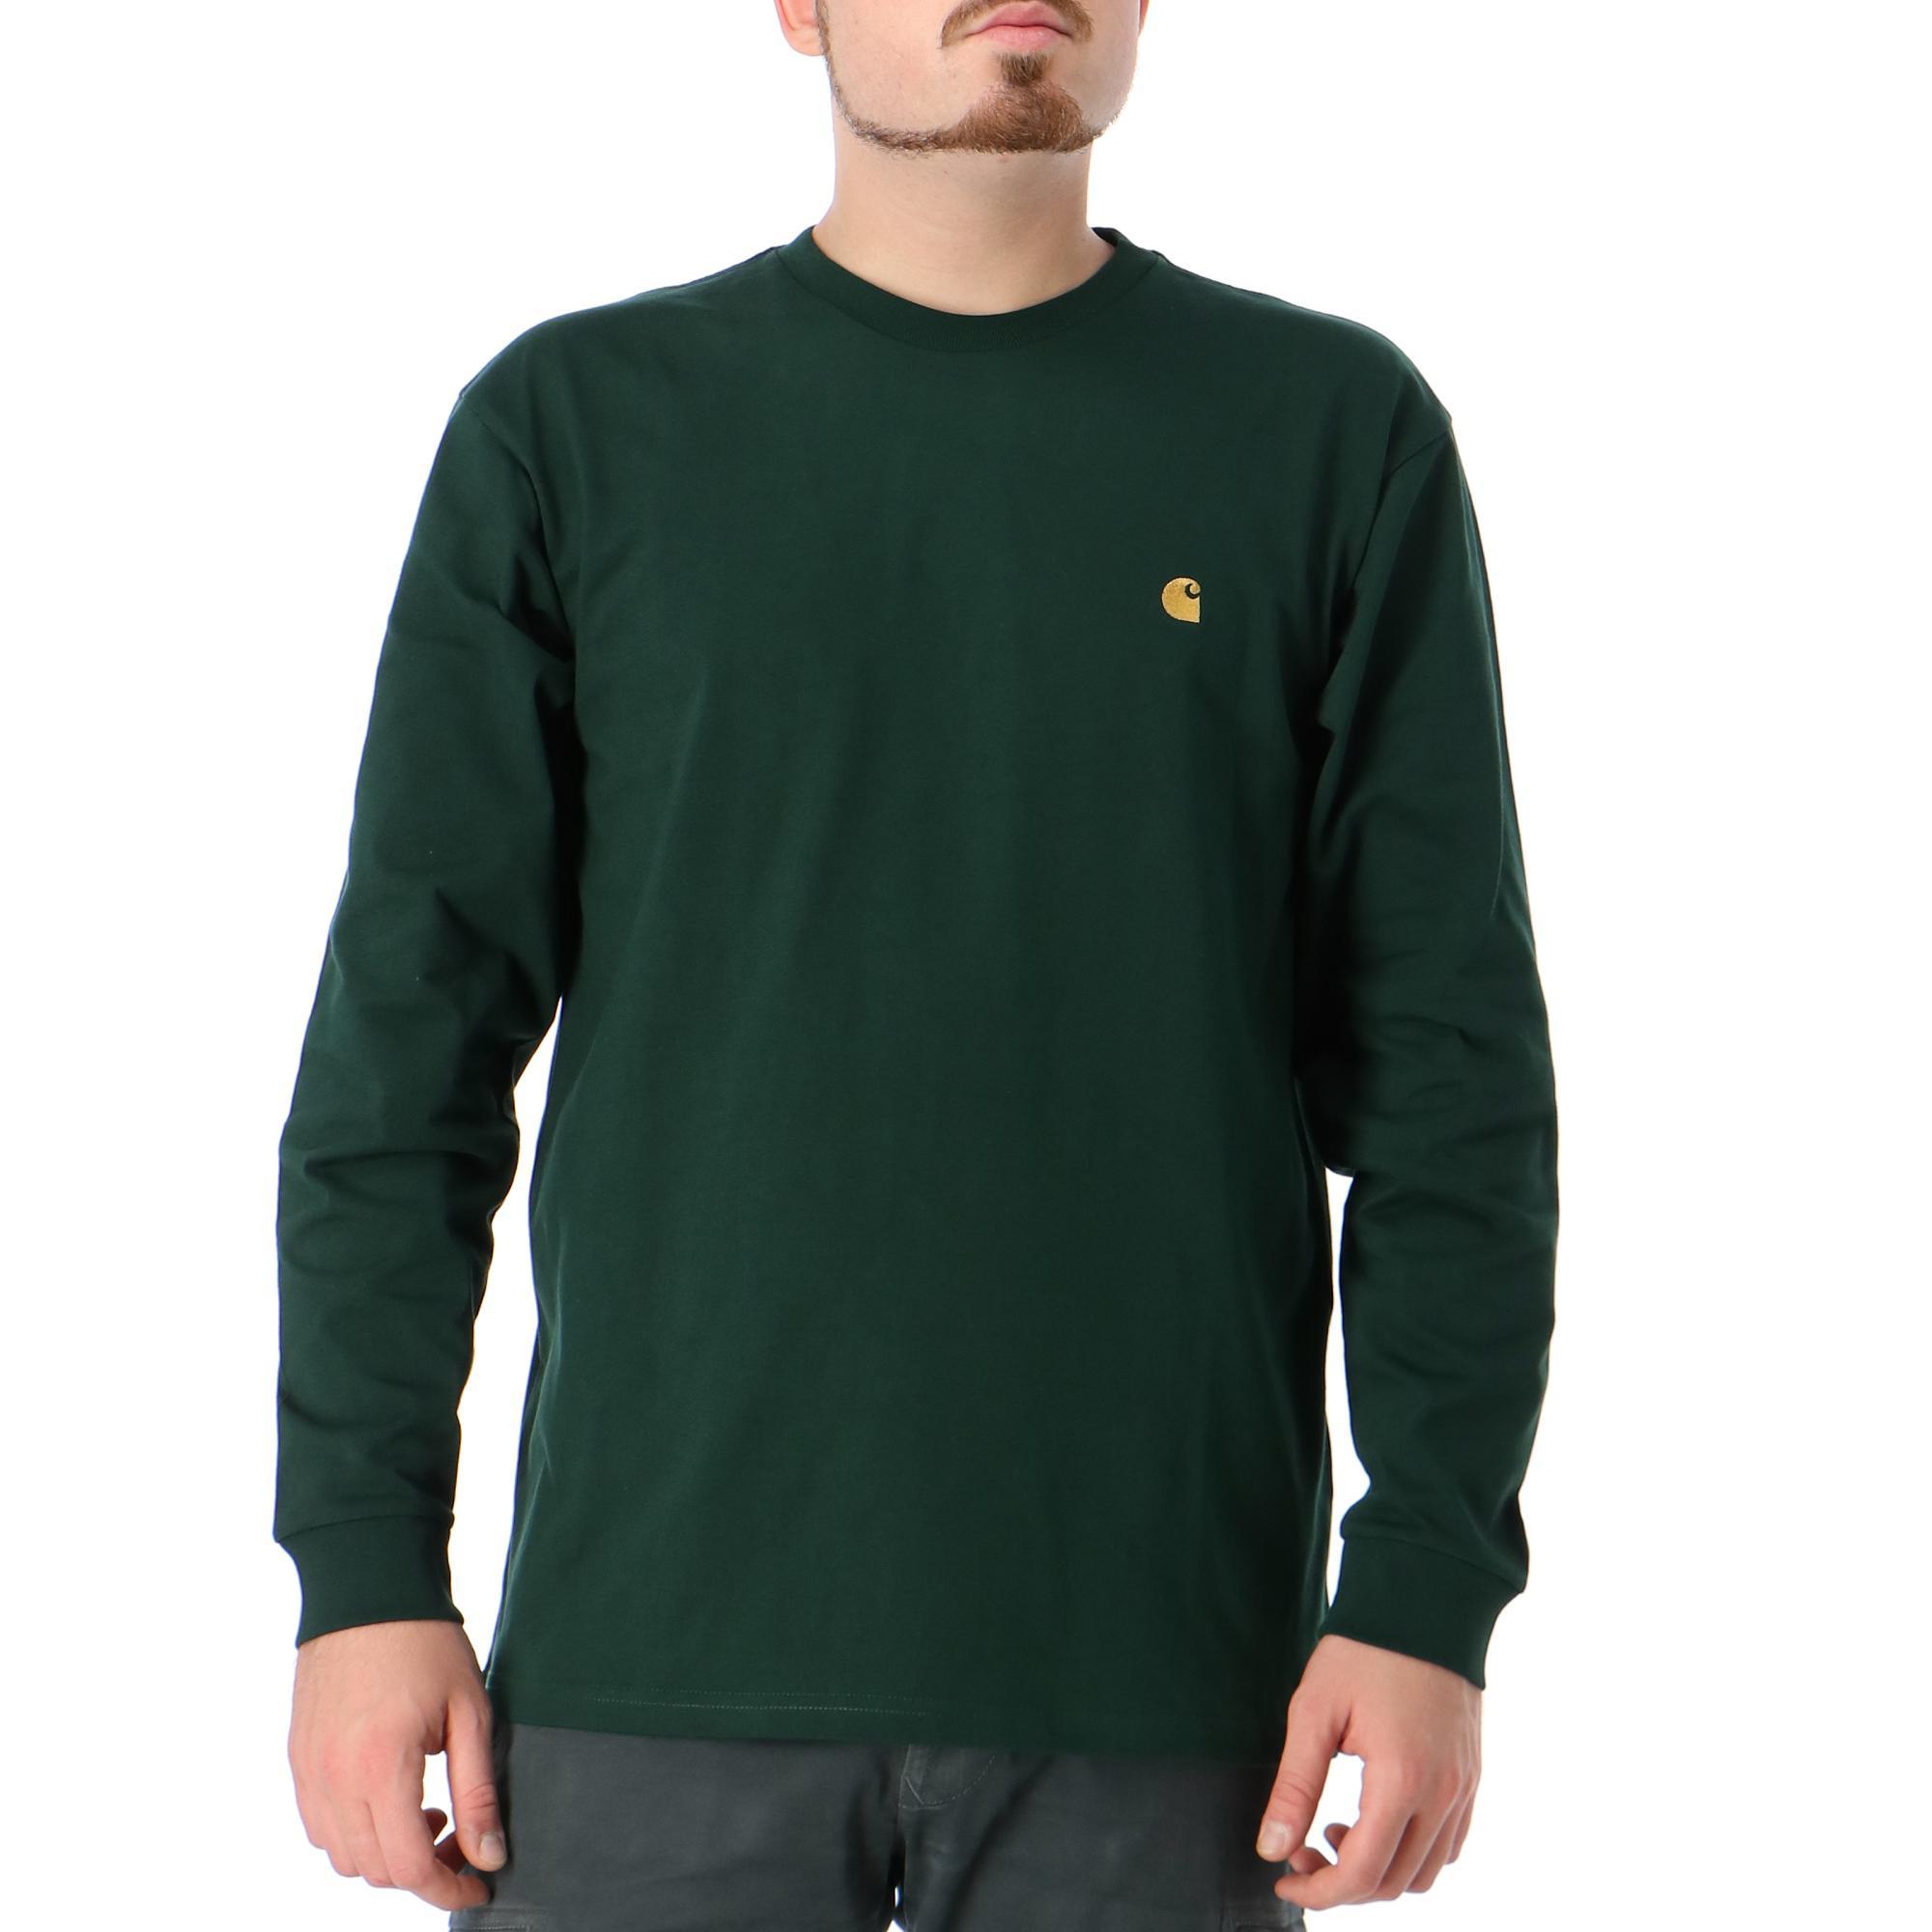 Carhartt L/s Chase T-shirt Bottle green gold